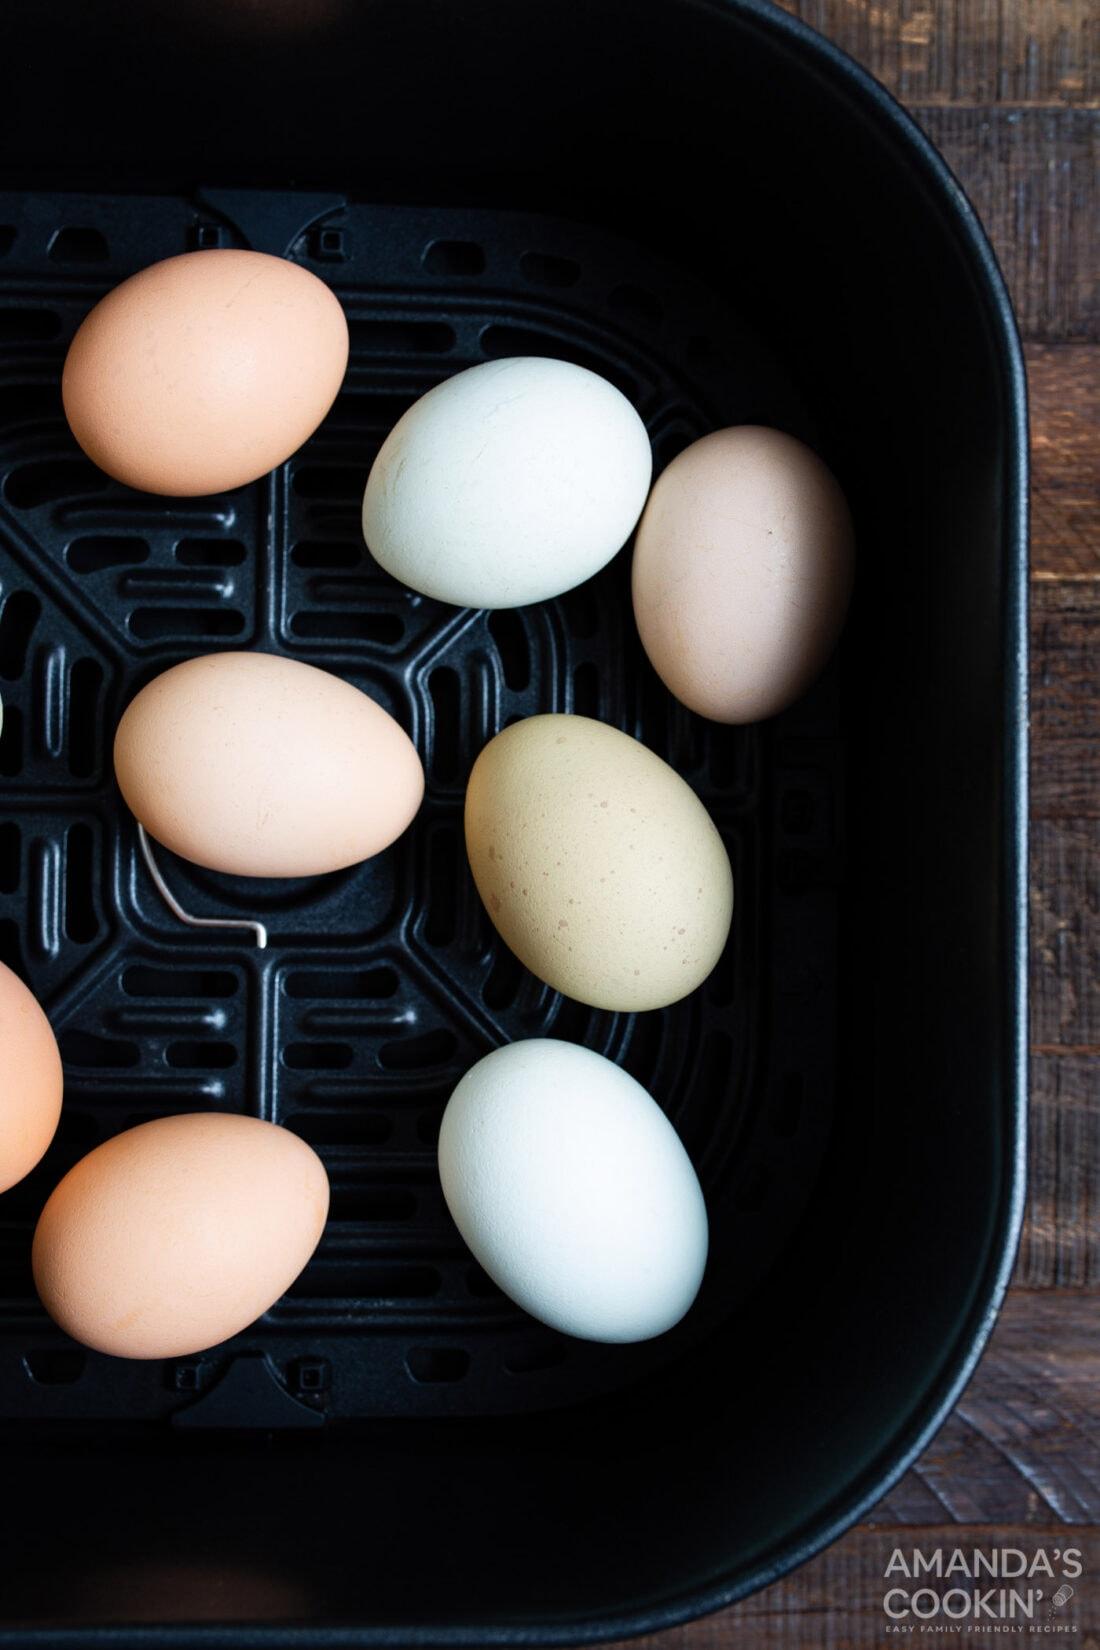 eggs in an air fryer basket